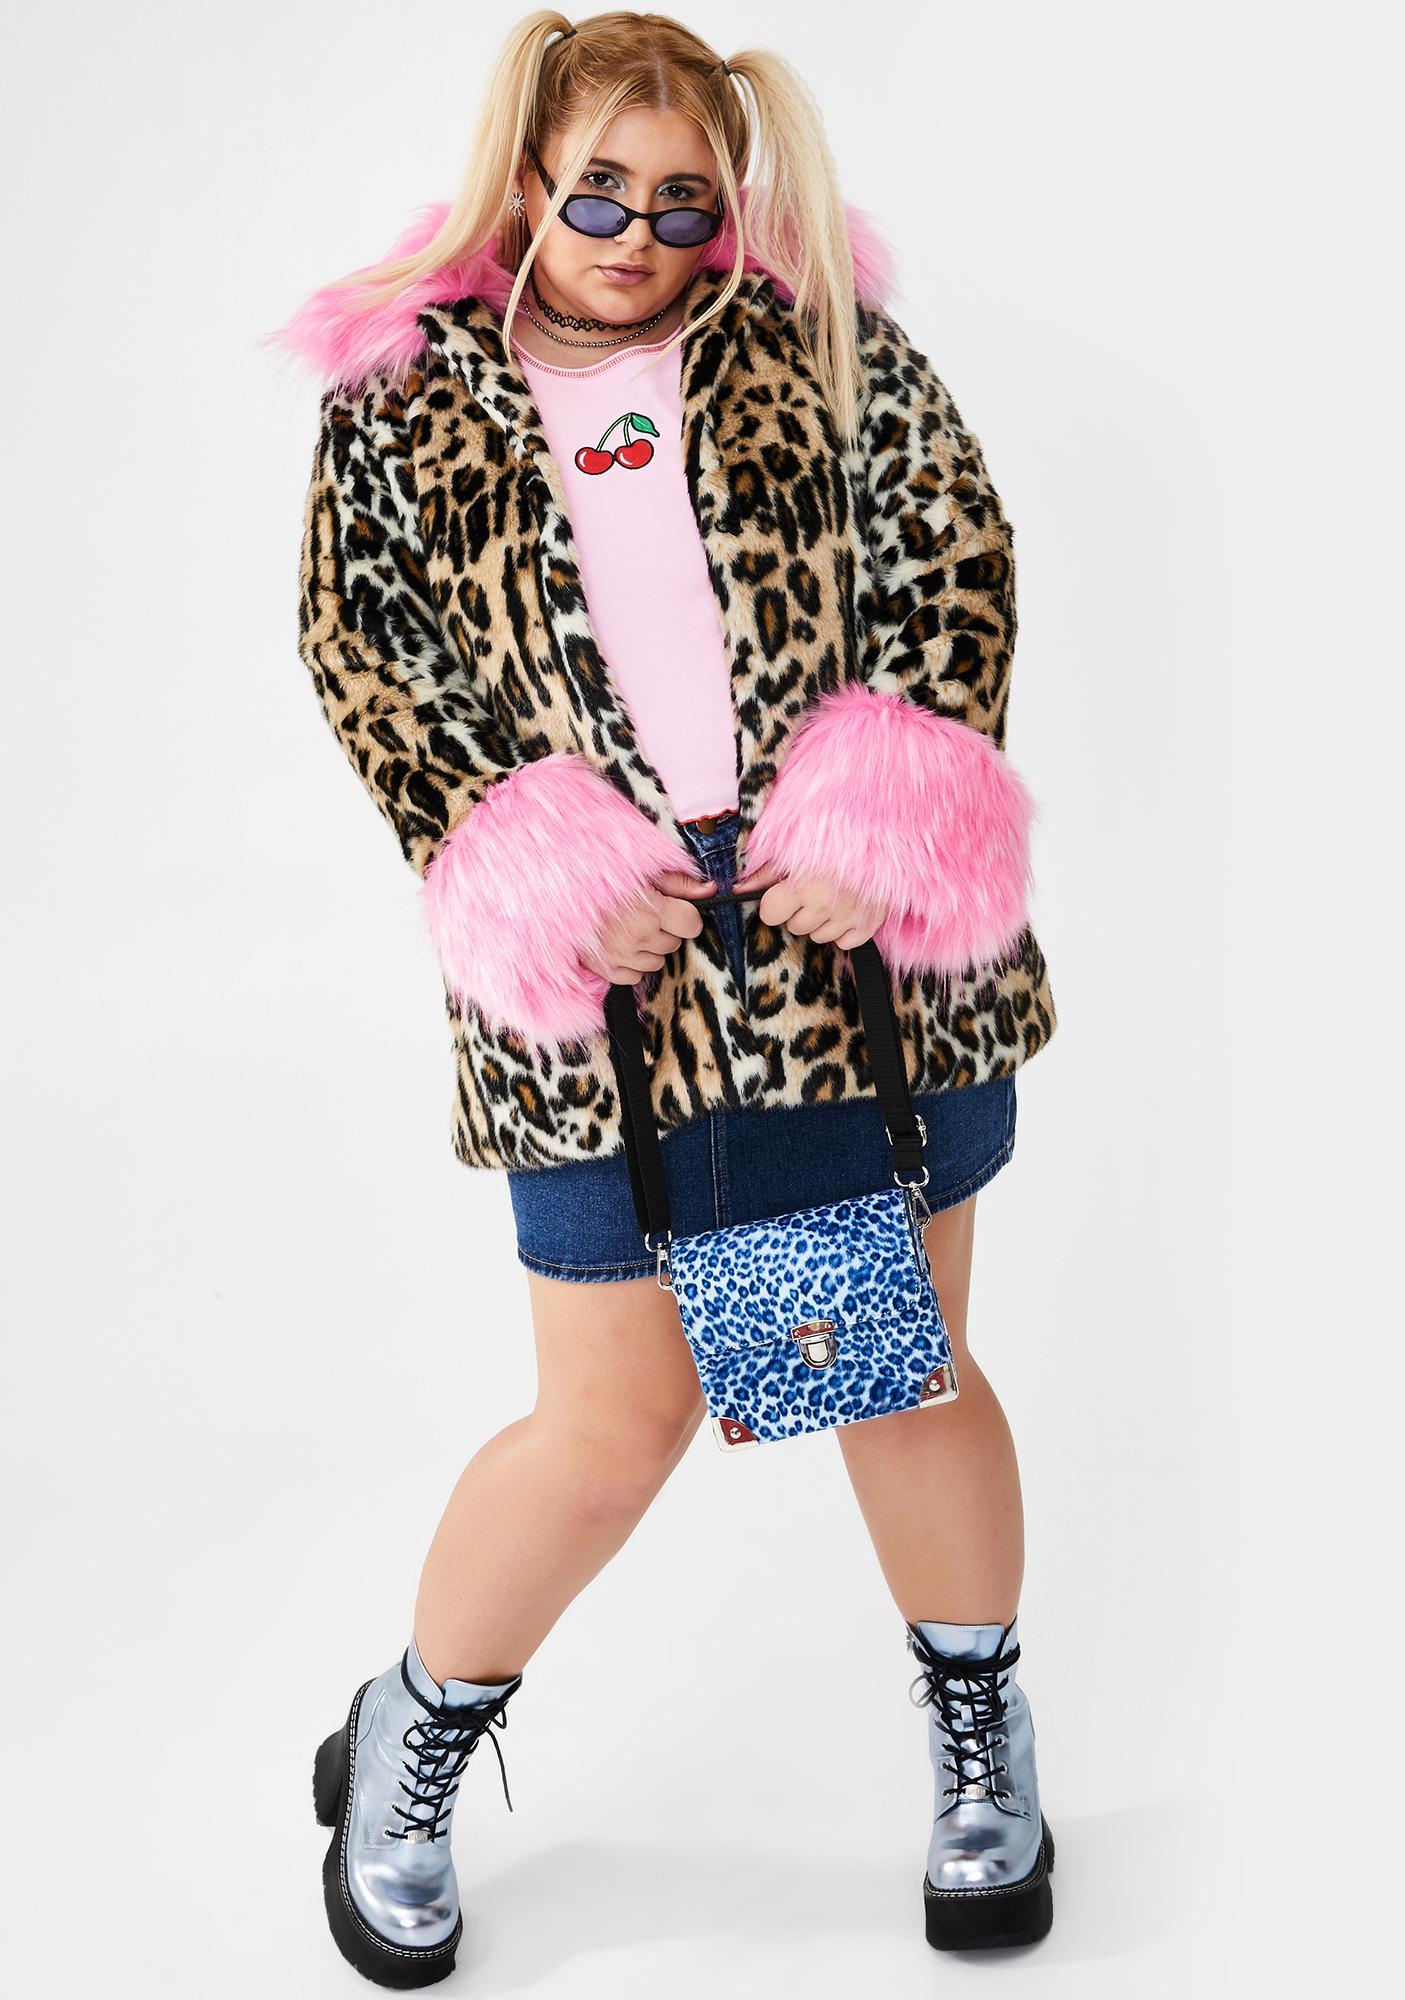 dELiA*s by Dolls Kill Major Sass Attack Faux Fur Coat